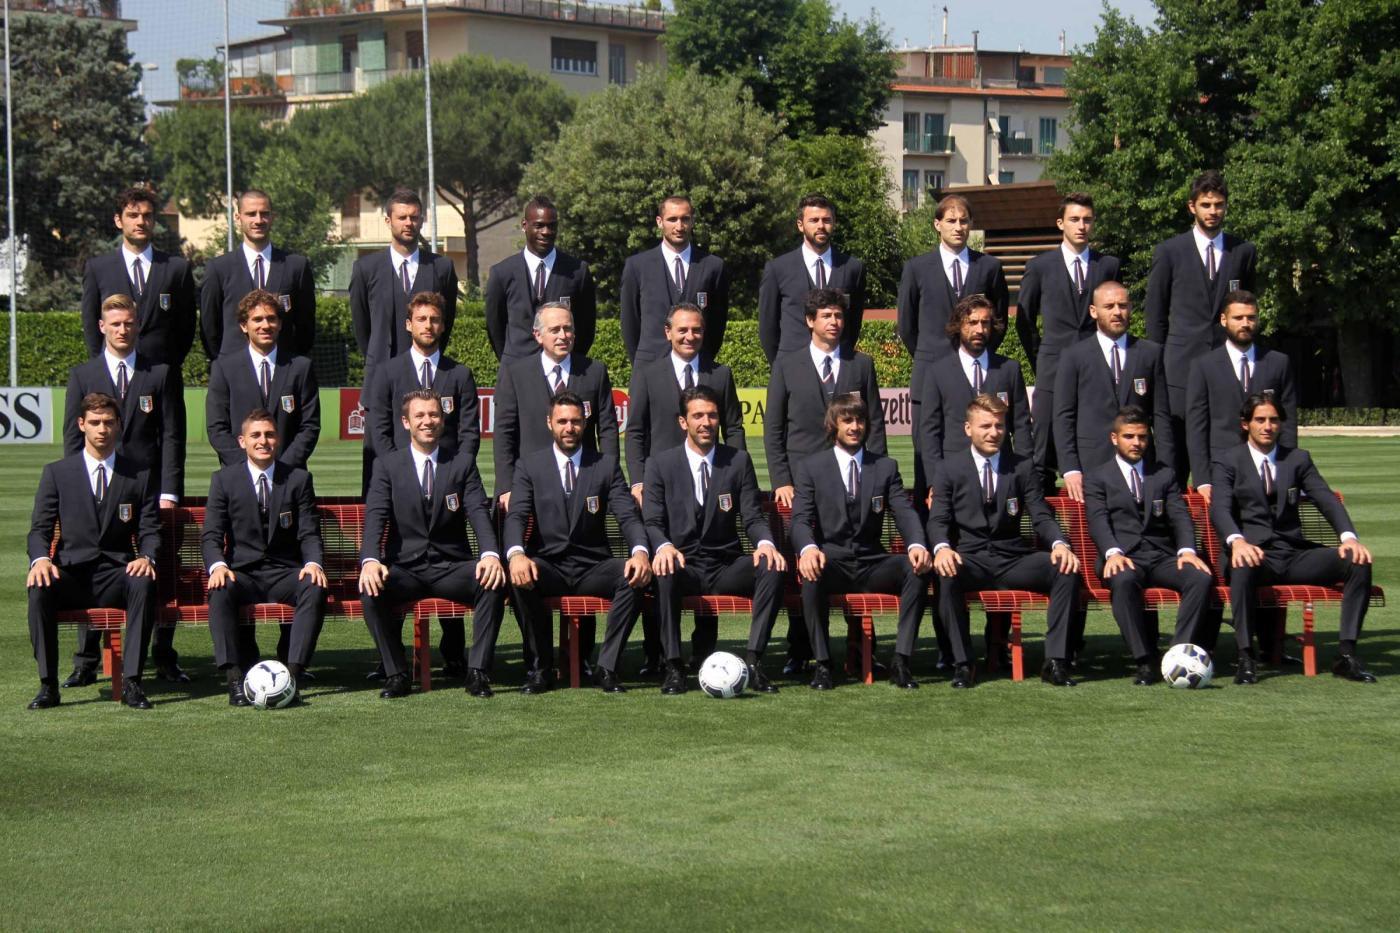 Mondiali Brasile 2014: gironi del campionato del mondo